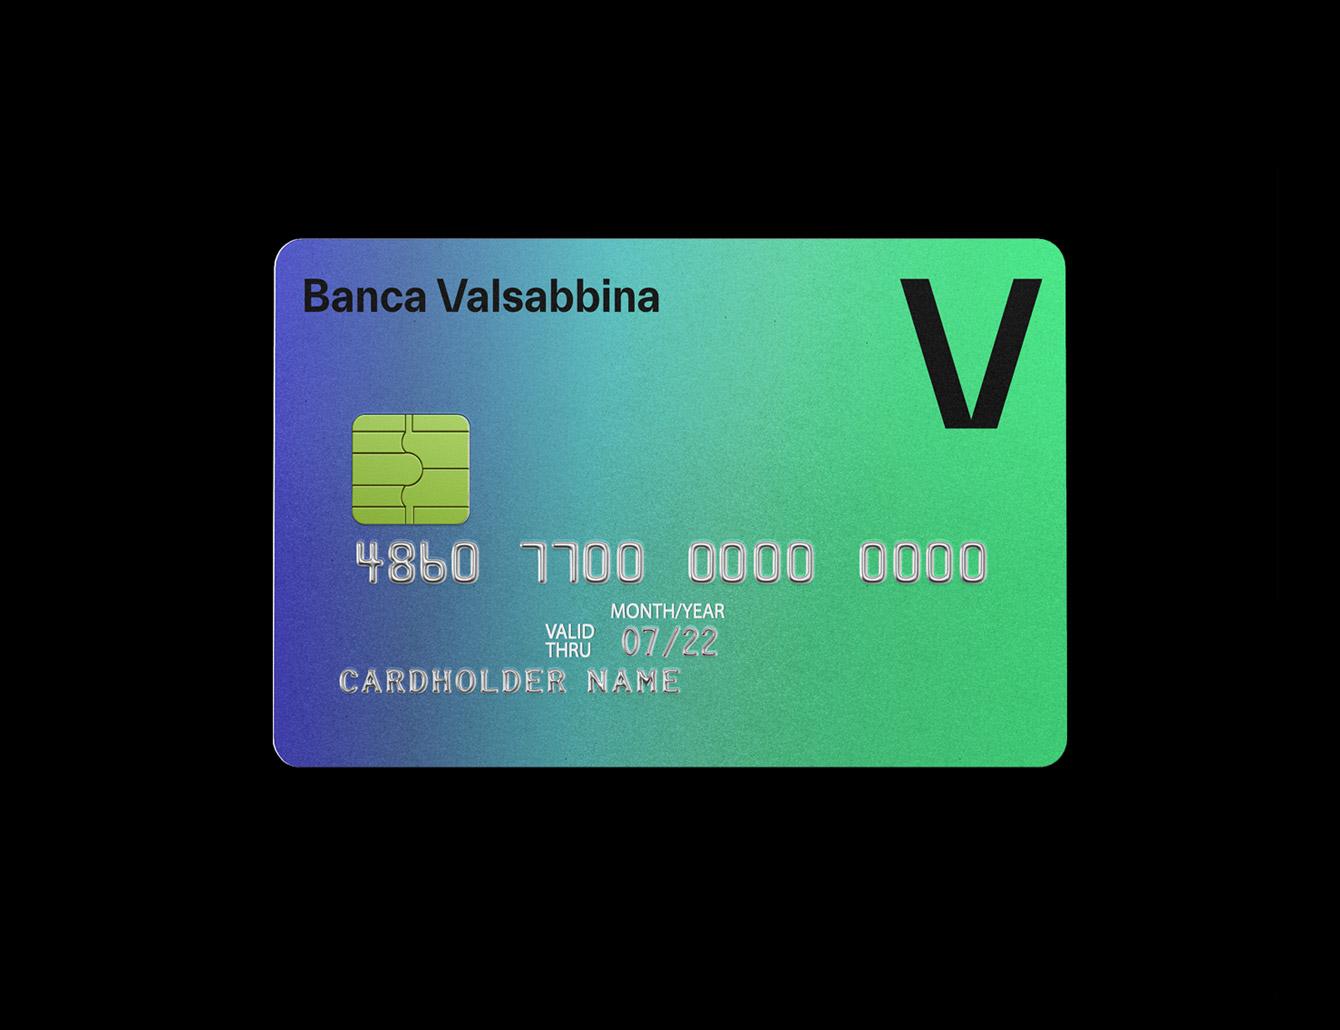 carte aziendali | Banca Valsabbina